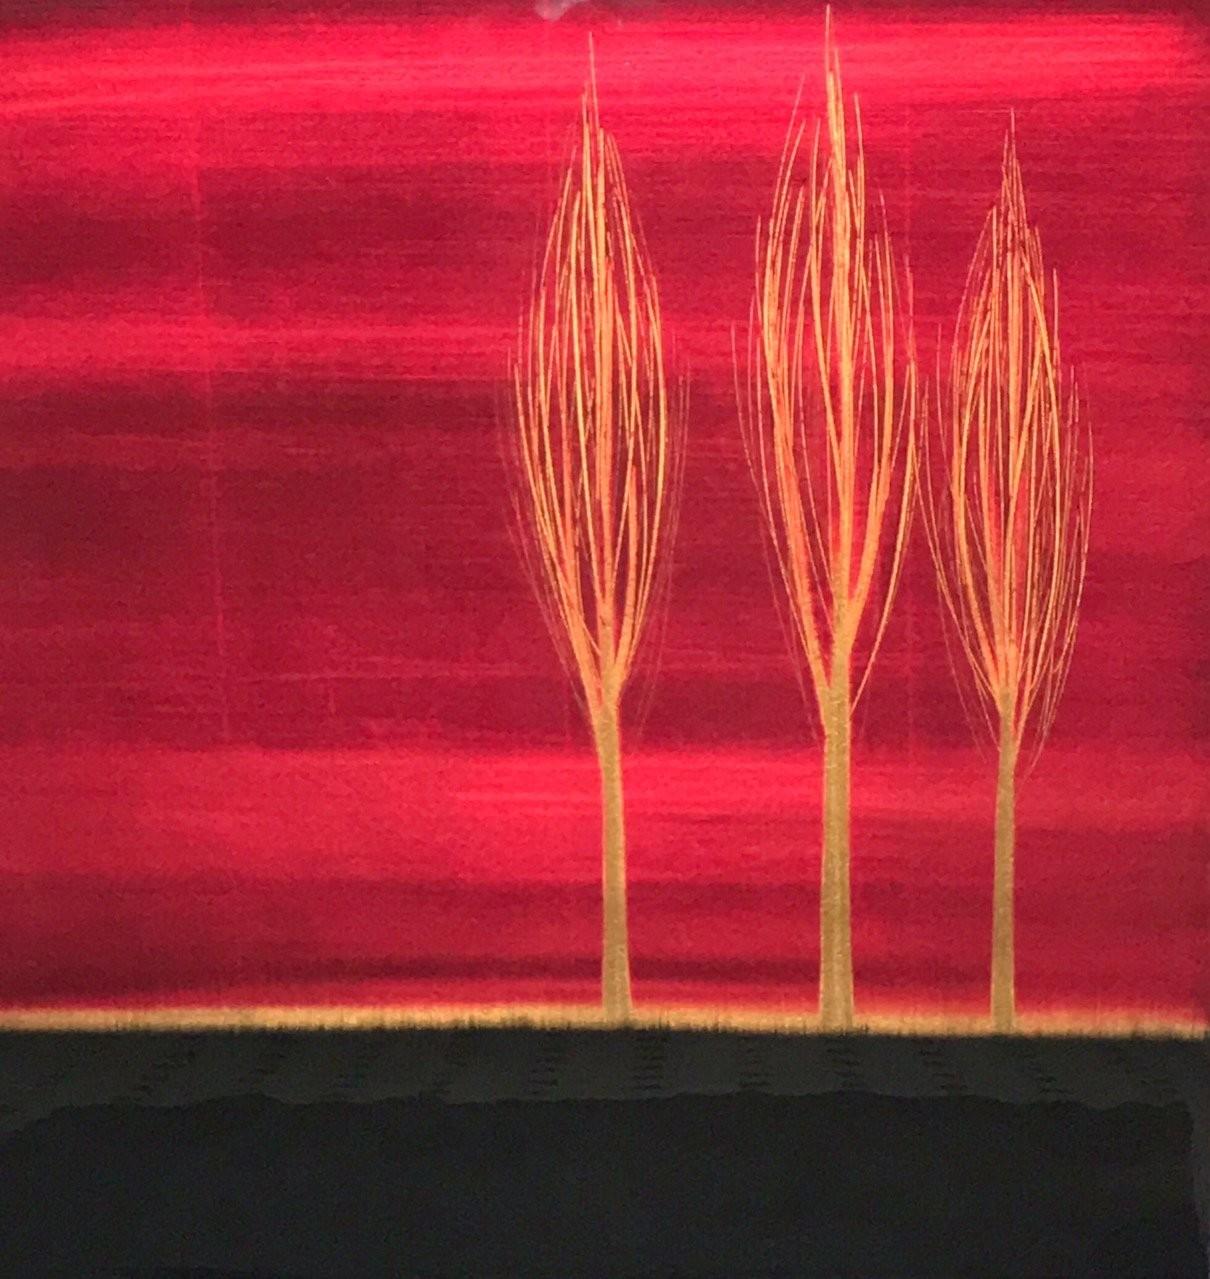 Trio, Red,oil, copper leaf, contemporary painting, original, Brazilian artist Hamilton Aguiar, resin painting, illuminating